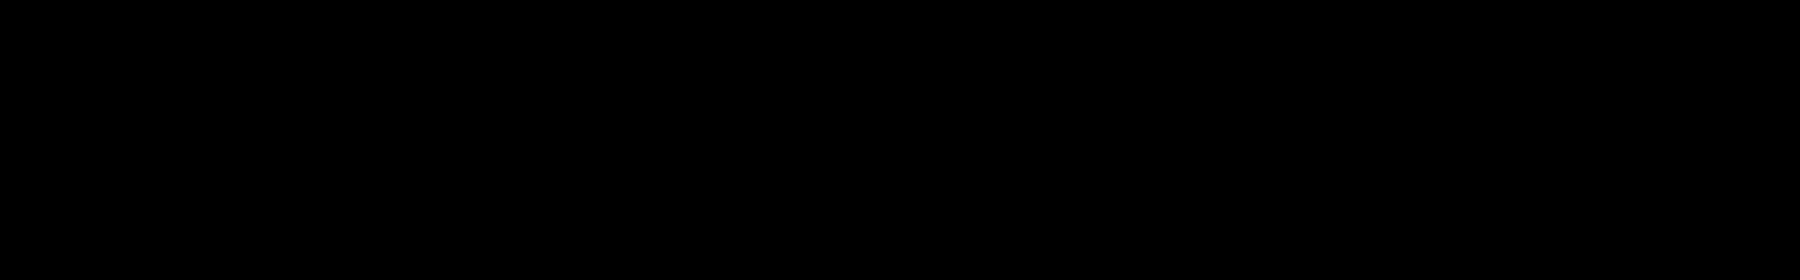 Neon Future Bass audio waveform